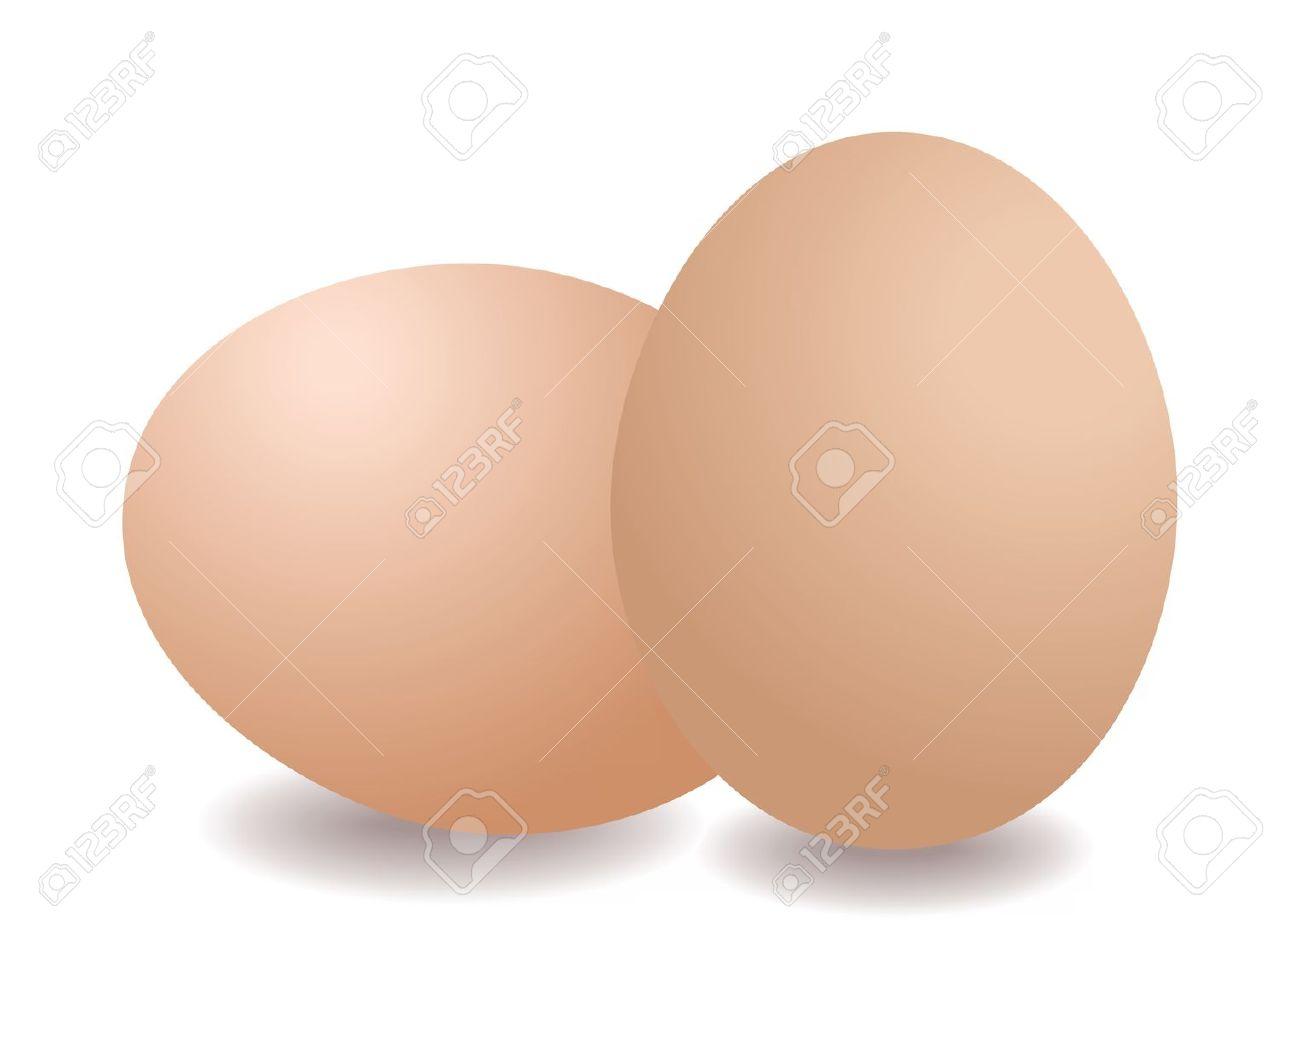 2 Eggs Clipart.